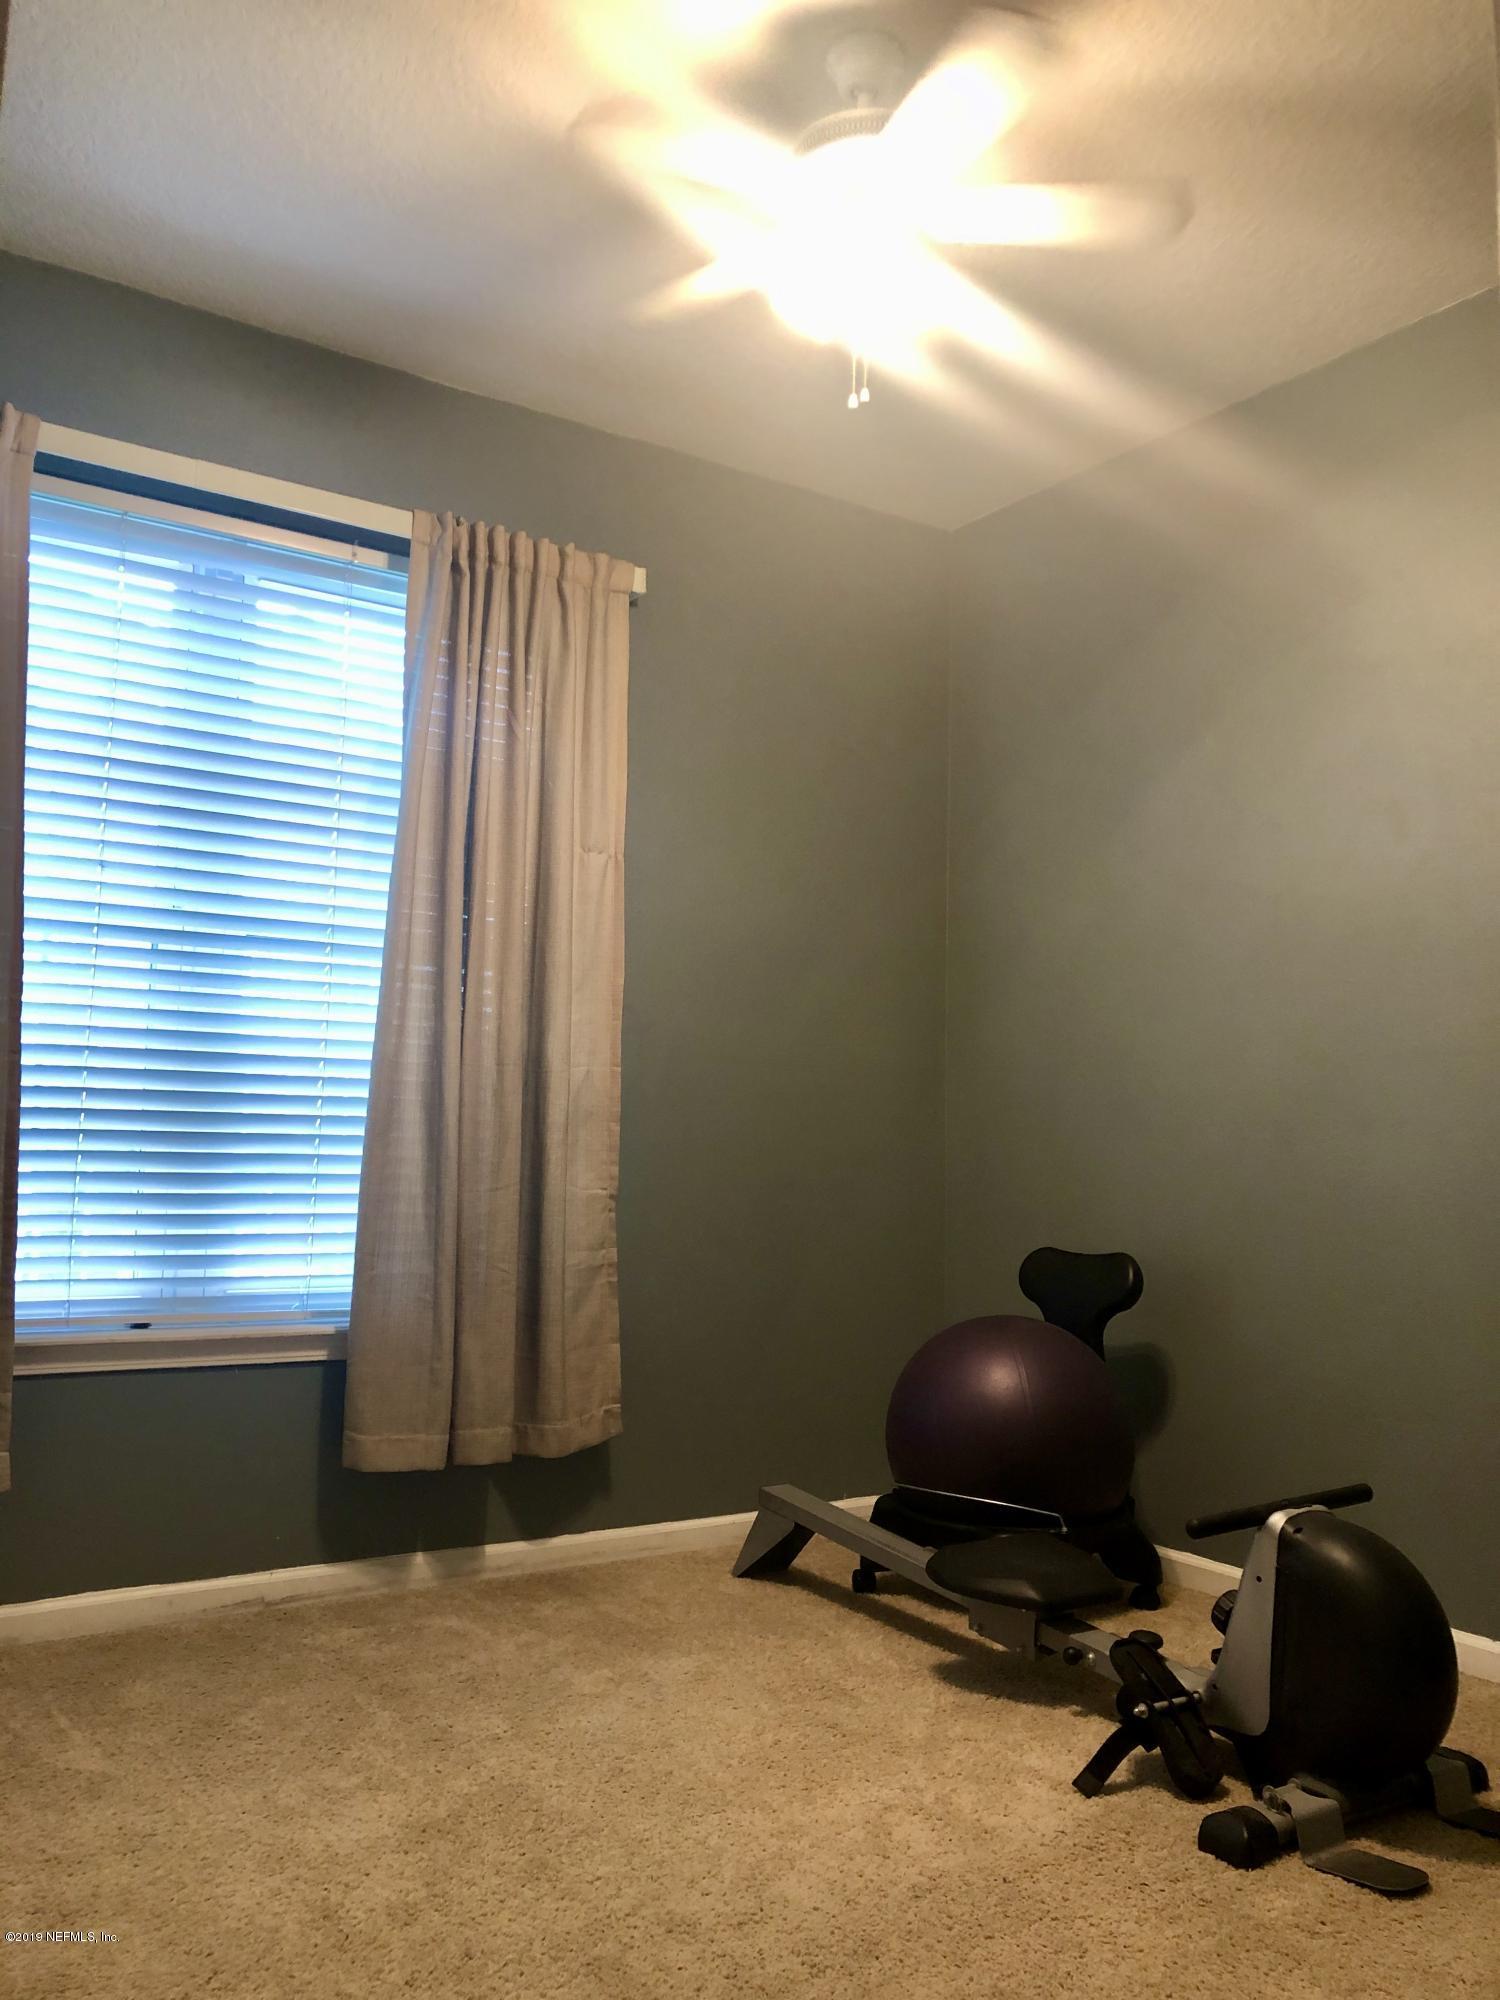 13364 BEACH, JACKSONVILLE, FLORIDA 32224, 3 Bedrooms Bedrooms, ,2 BathroomsBathrooms,Condo,For sale,BEACH,1018734